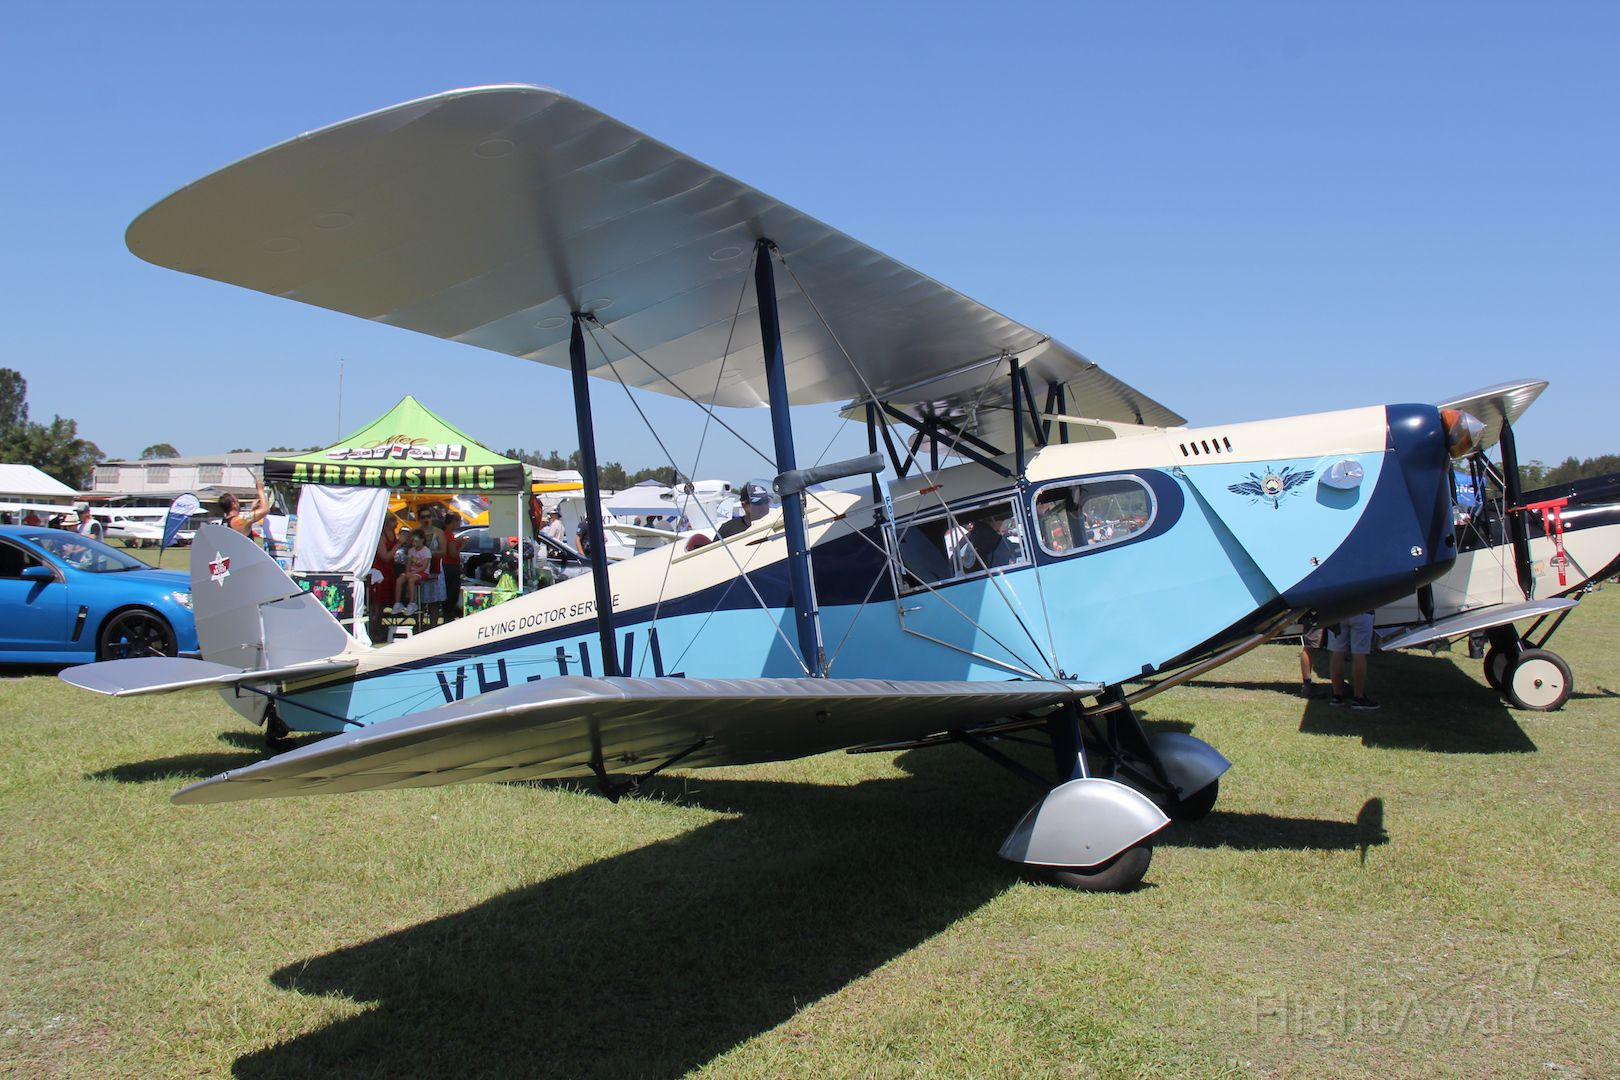 VH-UVL — - de Havilland DH-83 Fox Moth<br />Manufactured in 1935, UK<br />Maitland, NSW, Australia<br />Photo: 28.01.2017